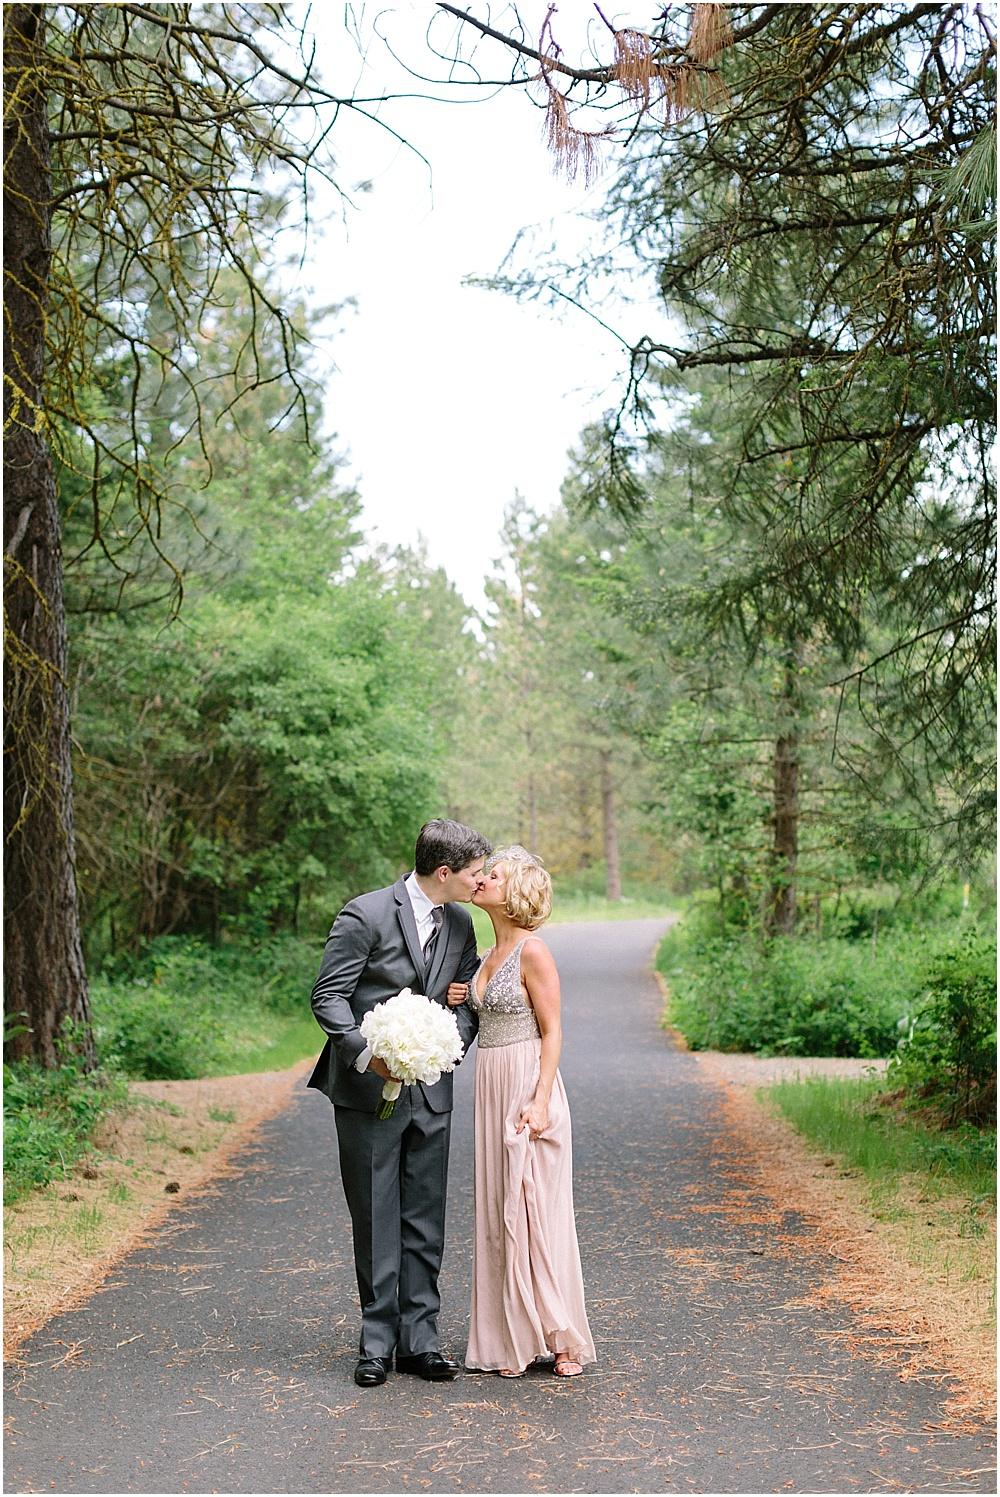 Swift_Water_Cellars_Washington_State_Wedding_Photographer_0021